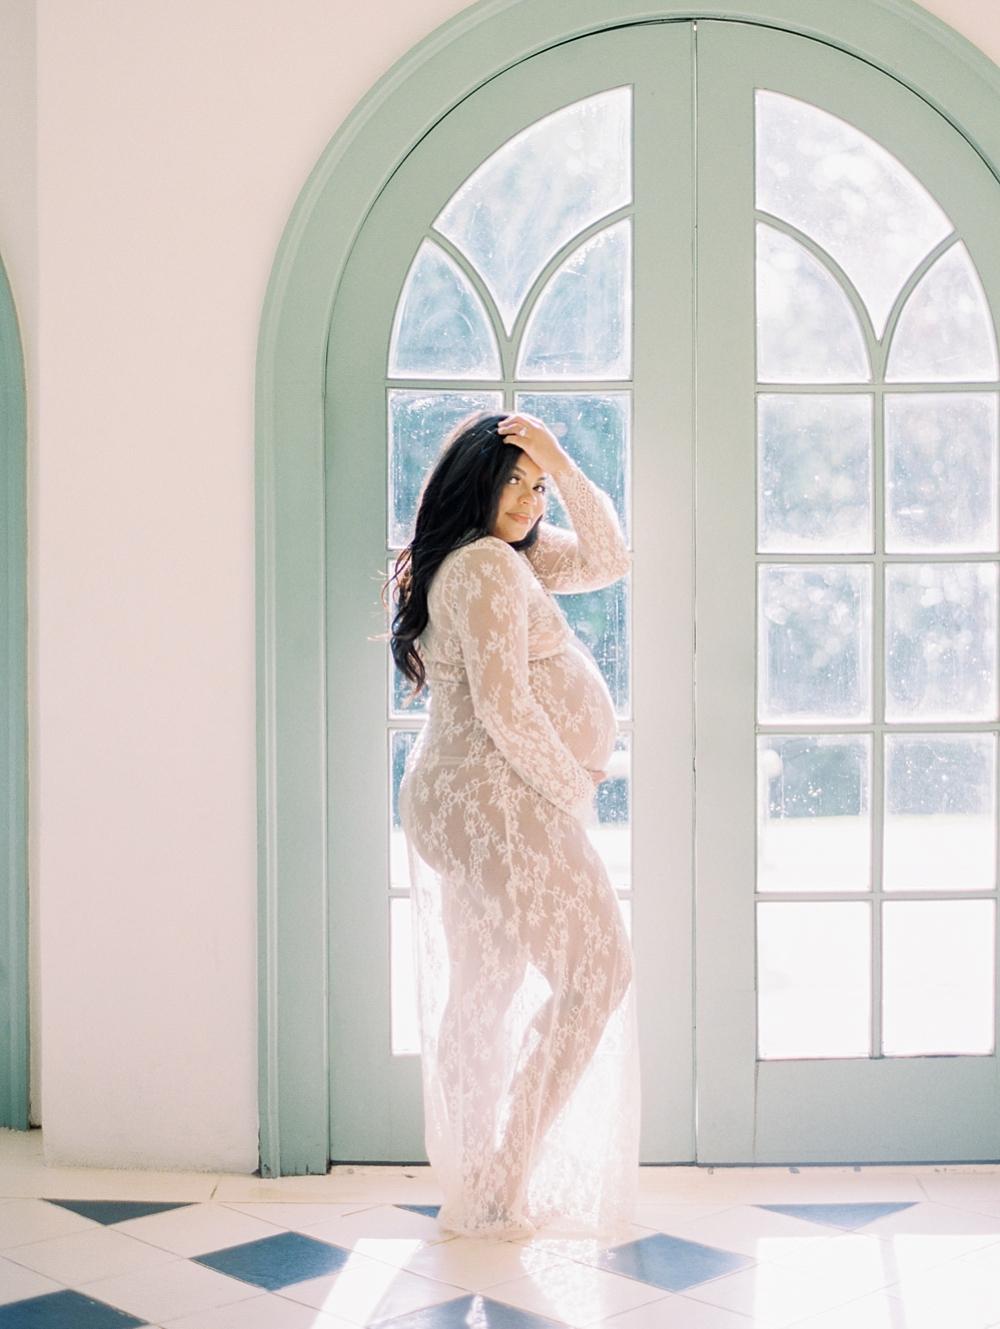 kristin-la-voie-photography-Maternity-Laguna-Gloria-Austin-Photographer-19